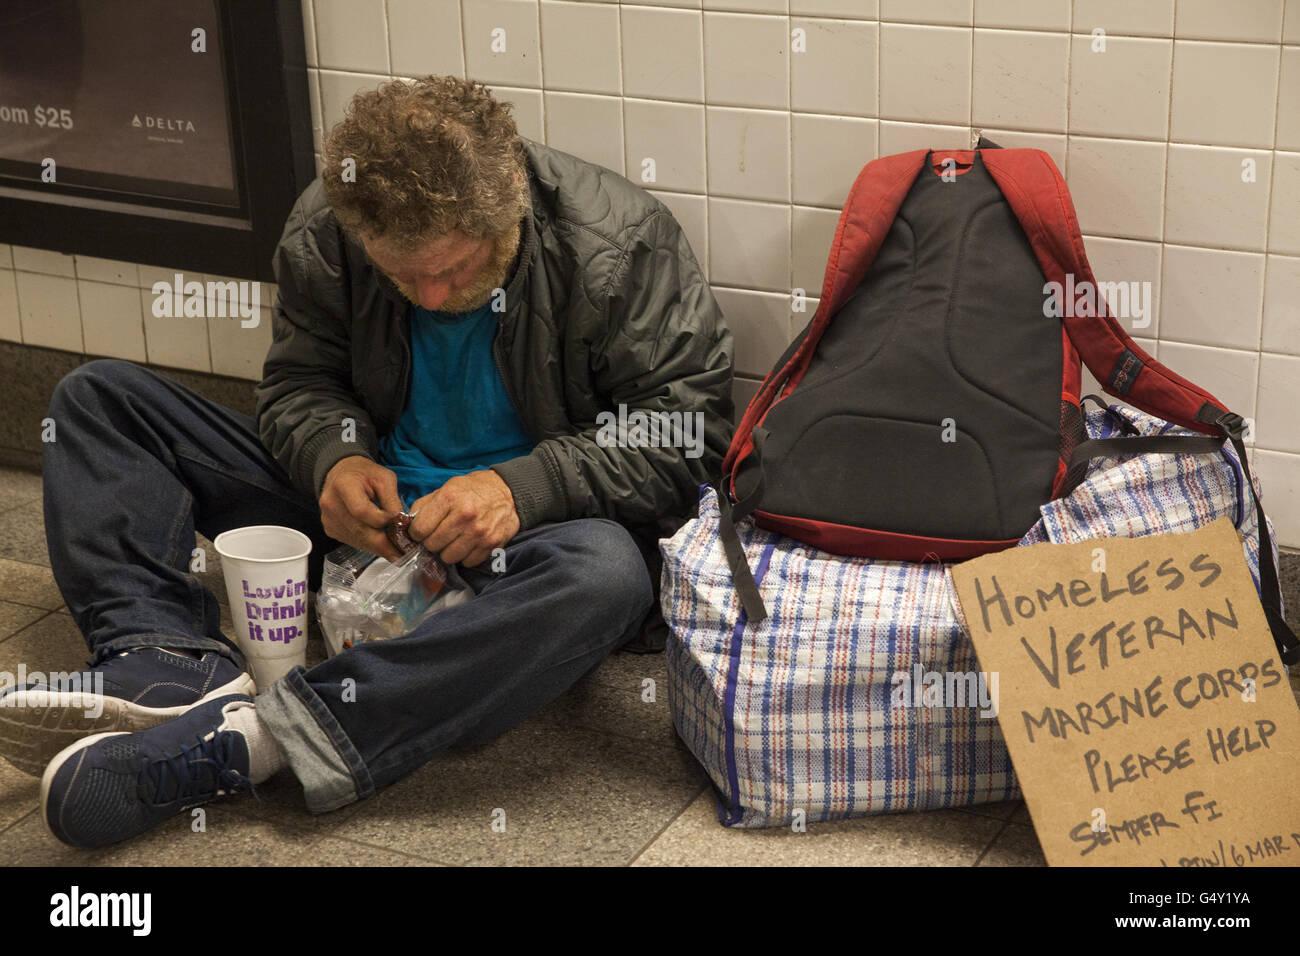 Homeless Marine Corps veteran on the street in New York City. - Stock Image